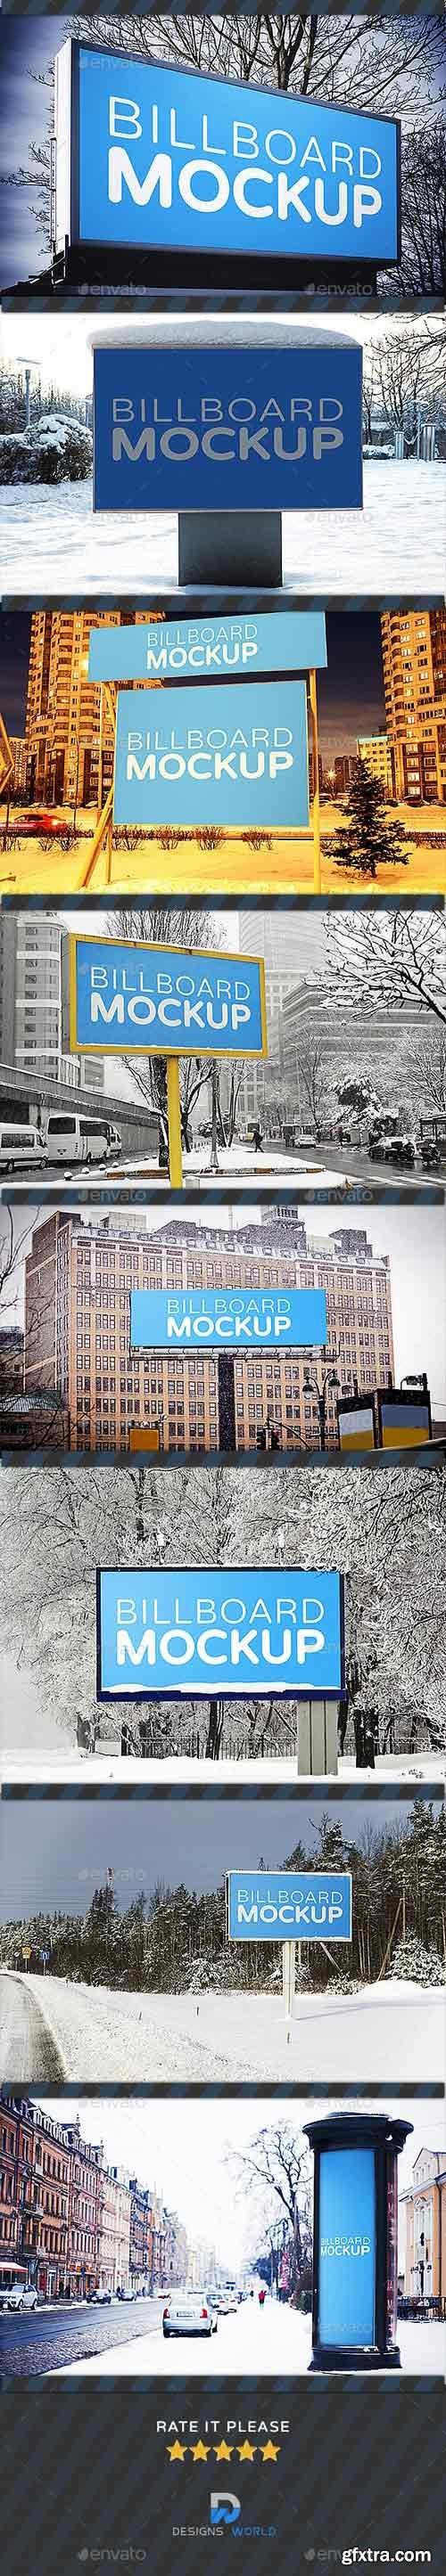 GraphicRiver - Billboards Mock-ups in Winter 18846023